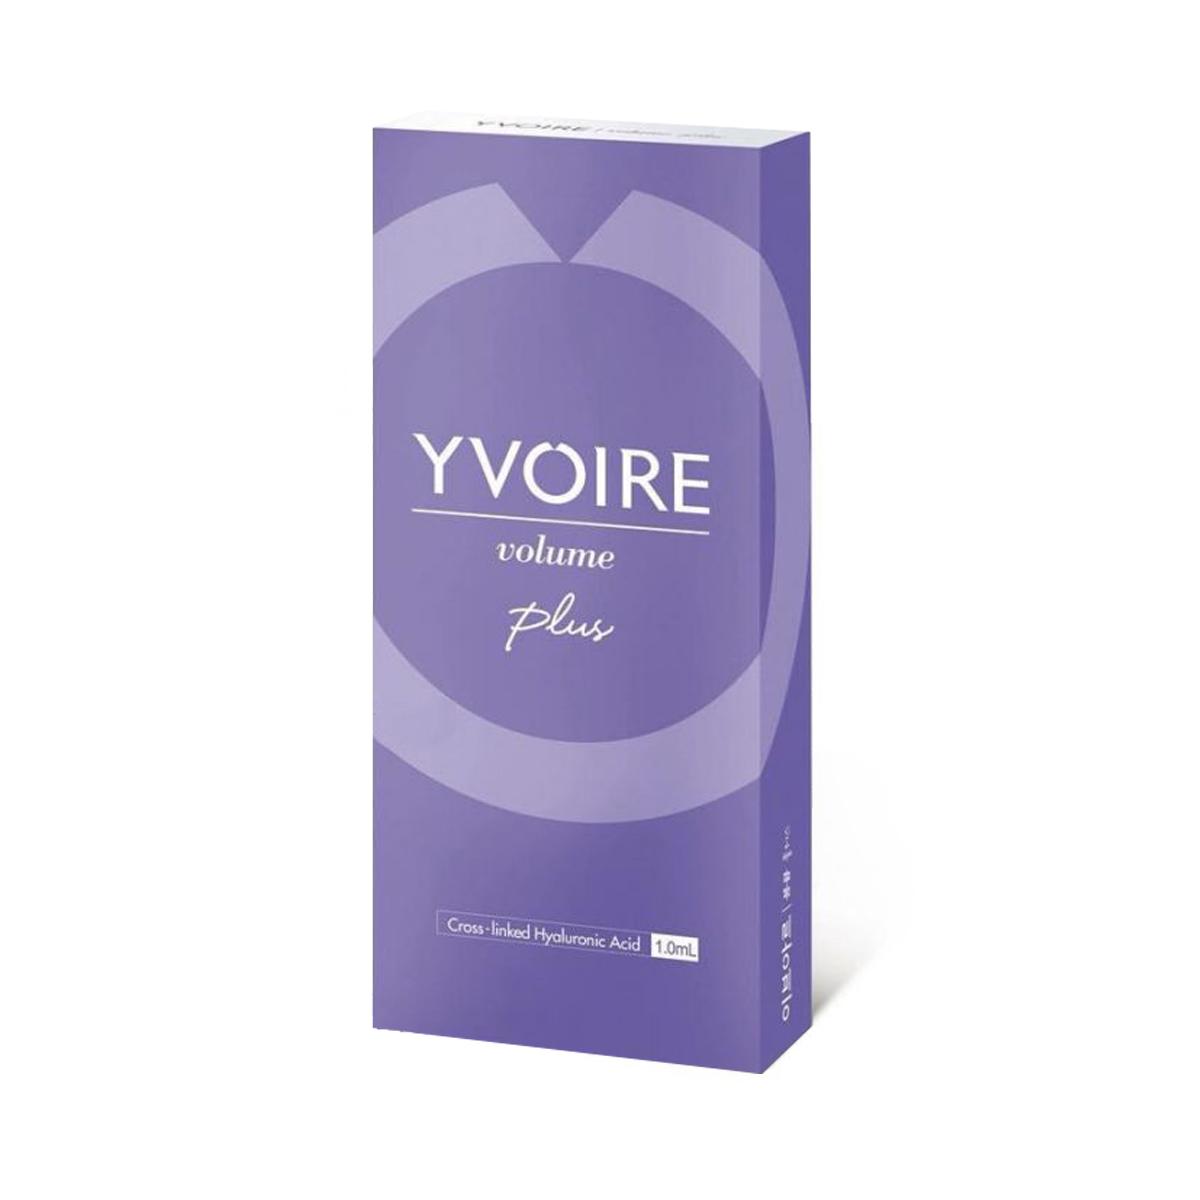 yvoire volume-